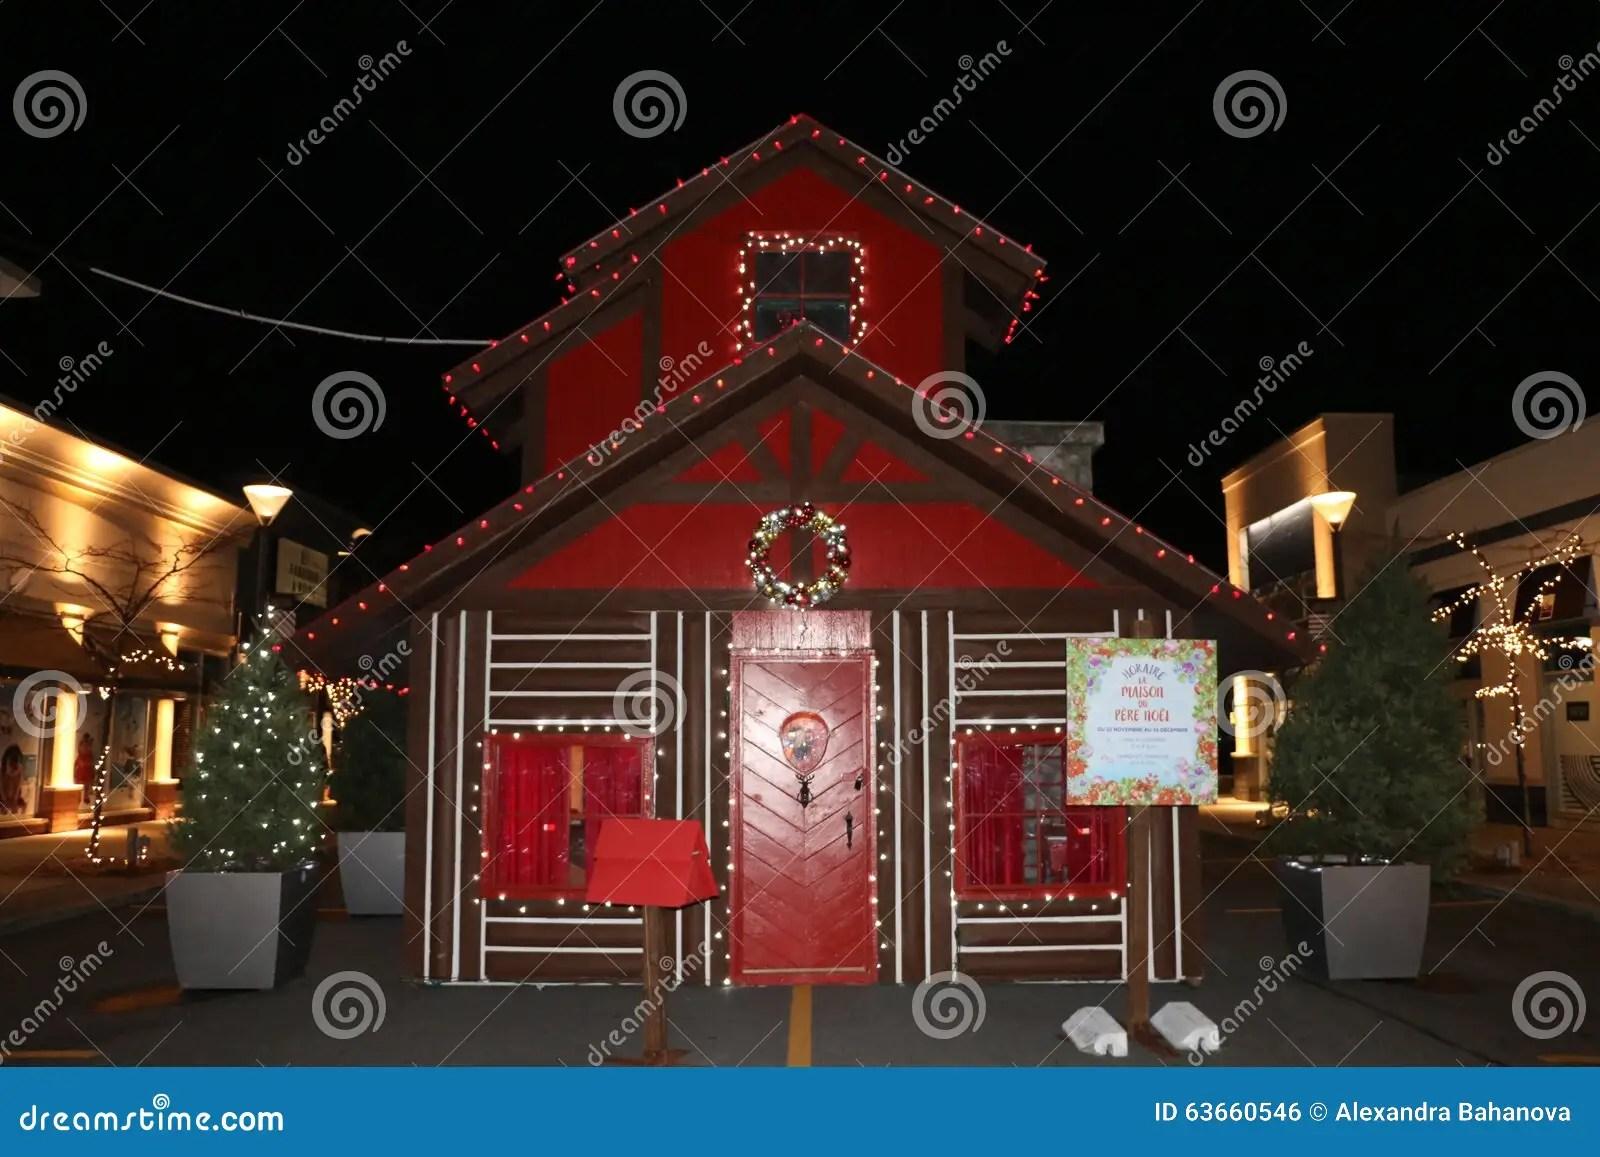 Santa Claus House Lights And Decorations At Dix30